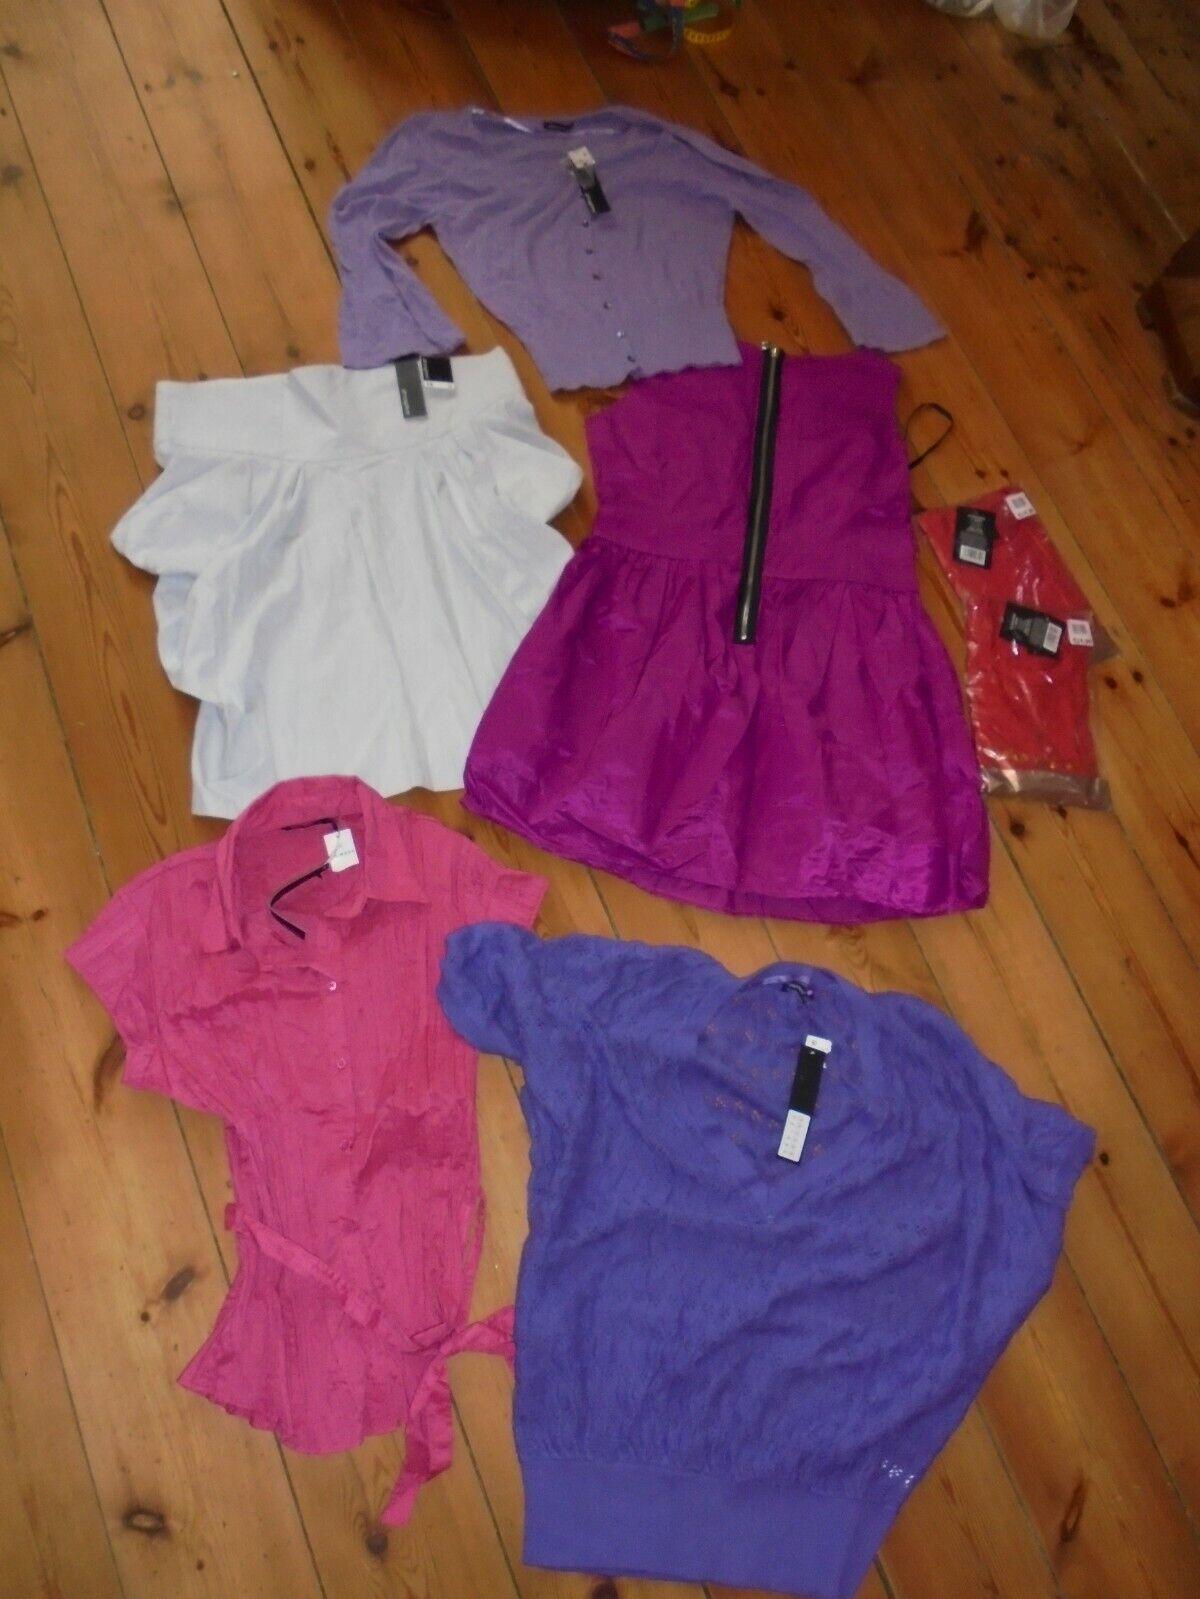 Plussize 46 Set Primark Ann Summers Kleid Rock Shirt X-Mas Strickjacke Bluse NEU